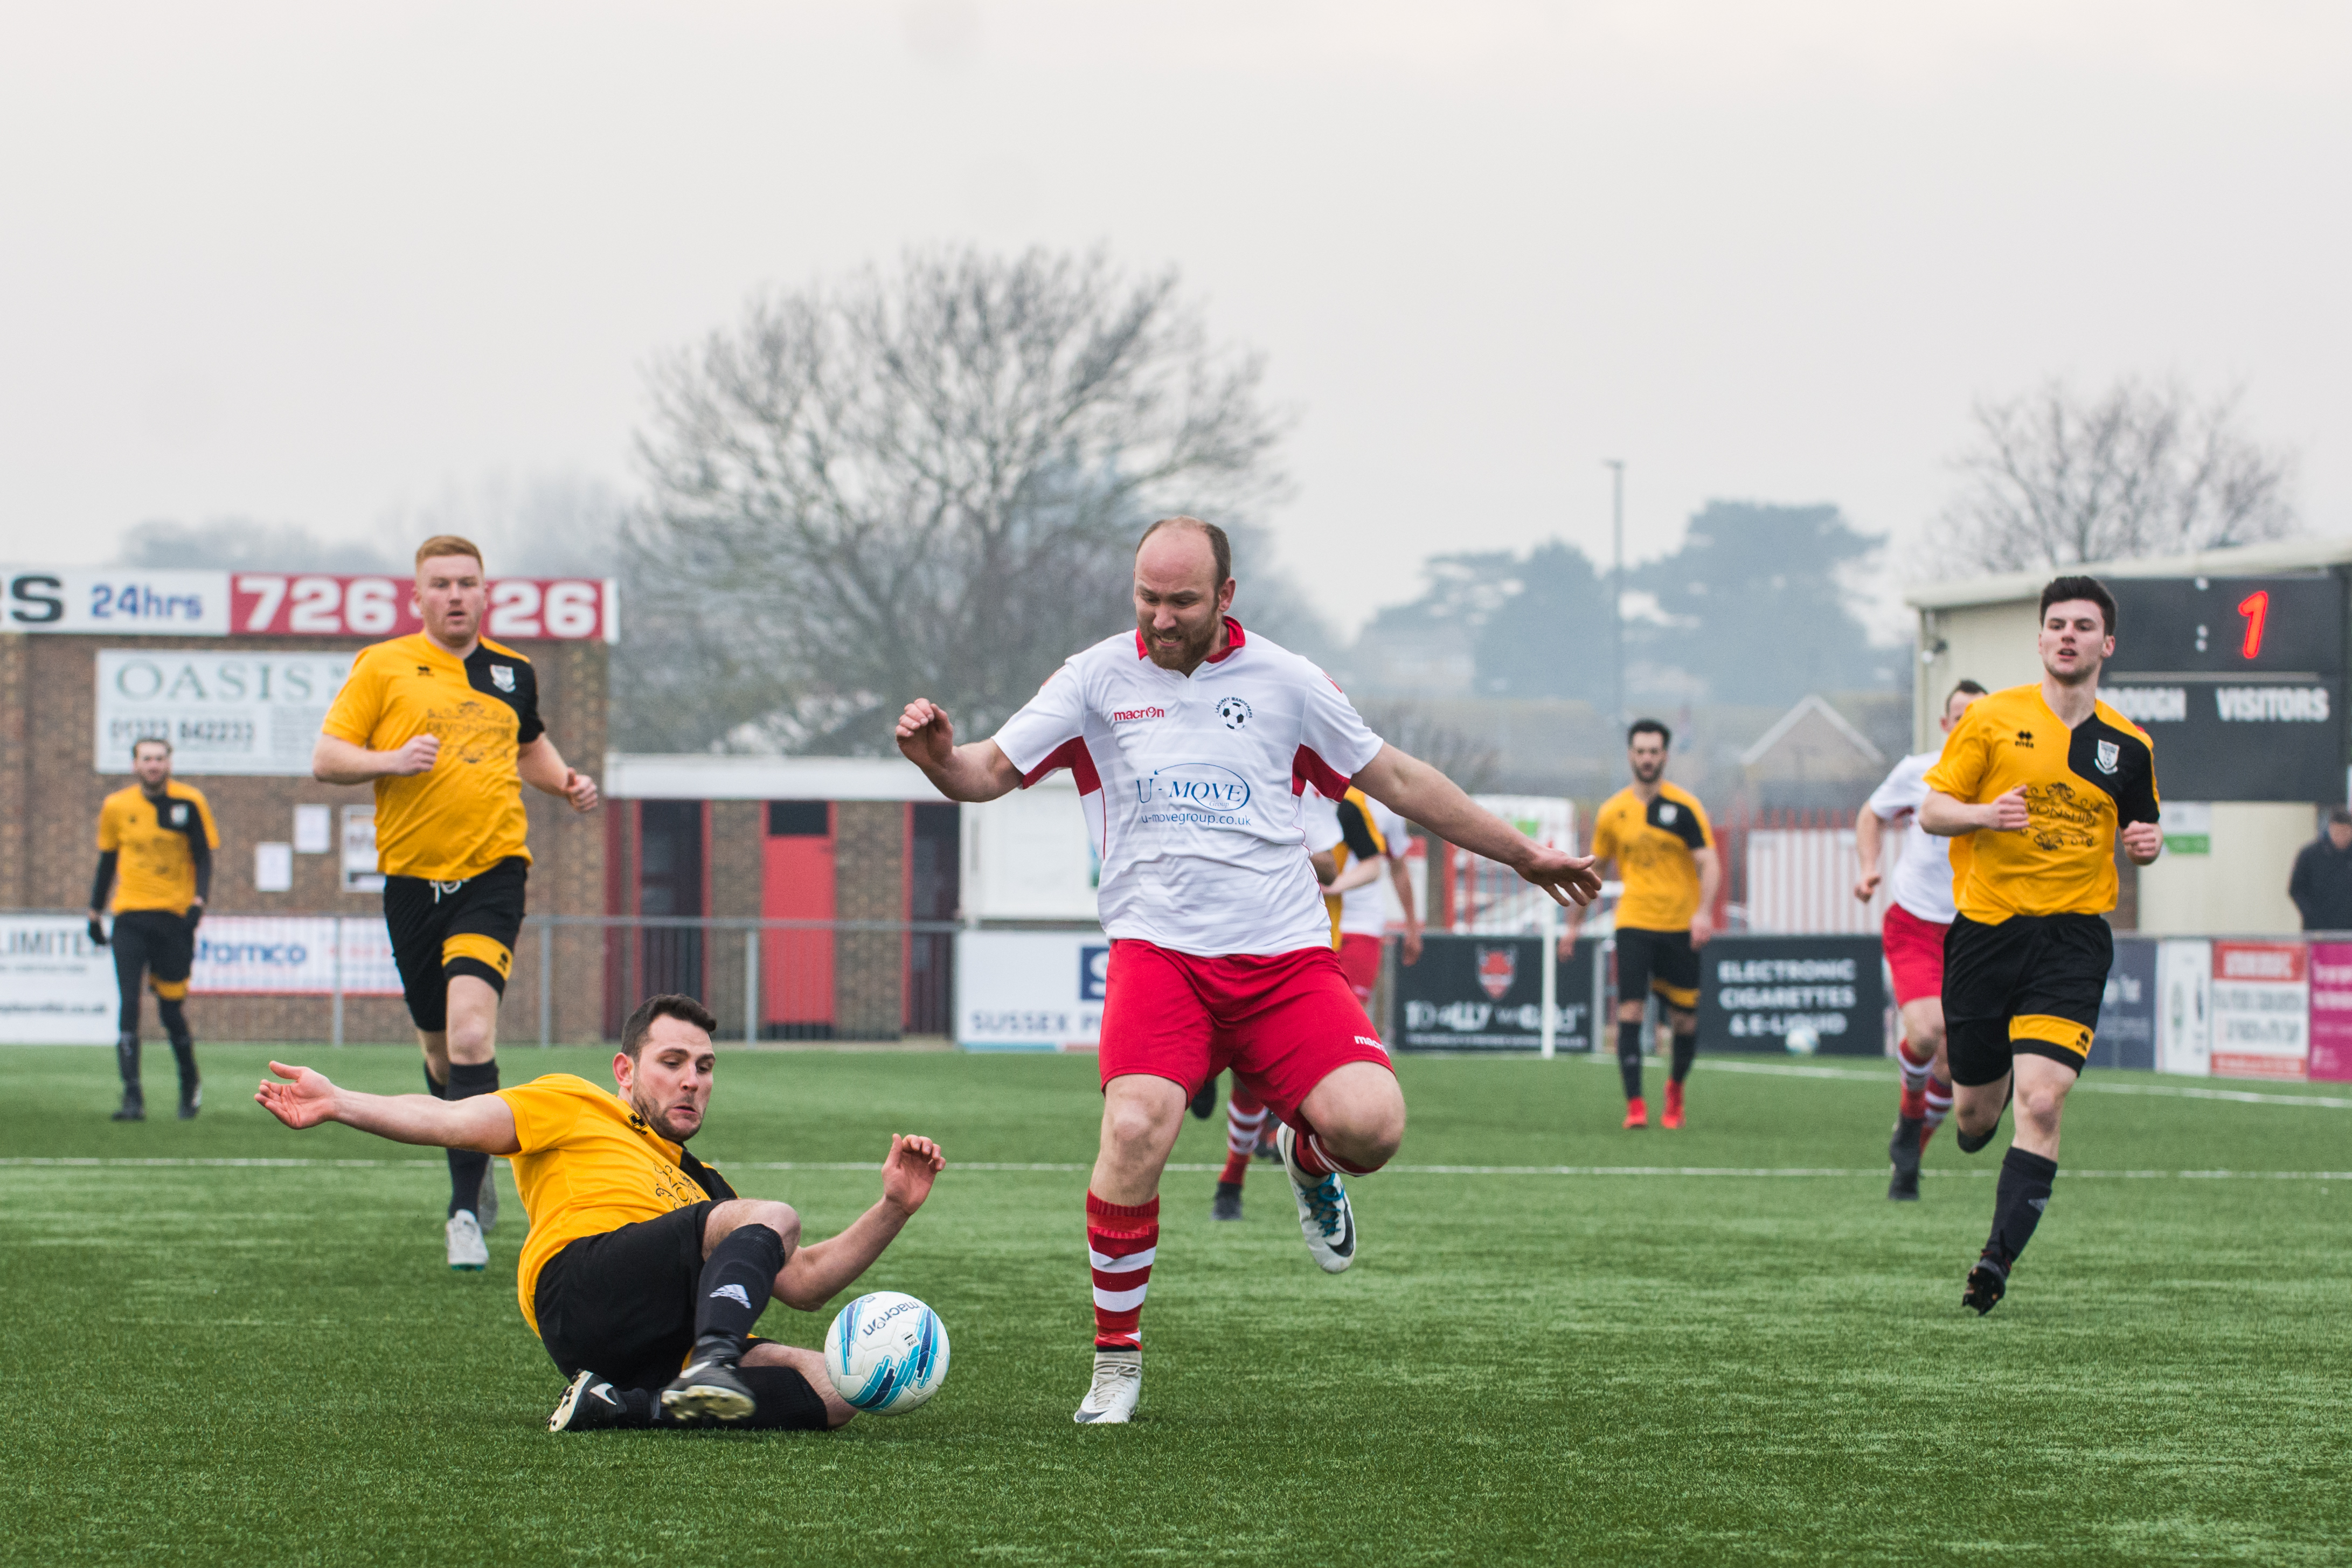 DAVID_JEFFERY Langney Wanderers FC vs Bexhill United FC 03.03.18 33